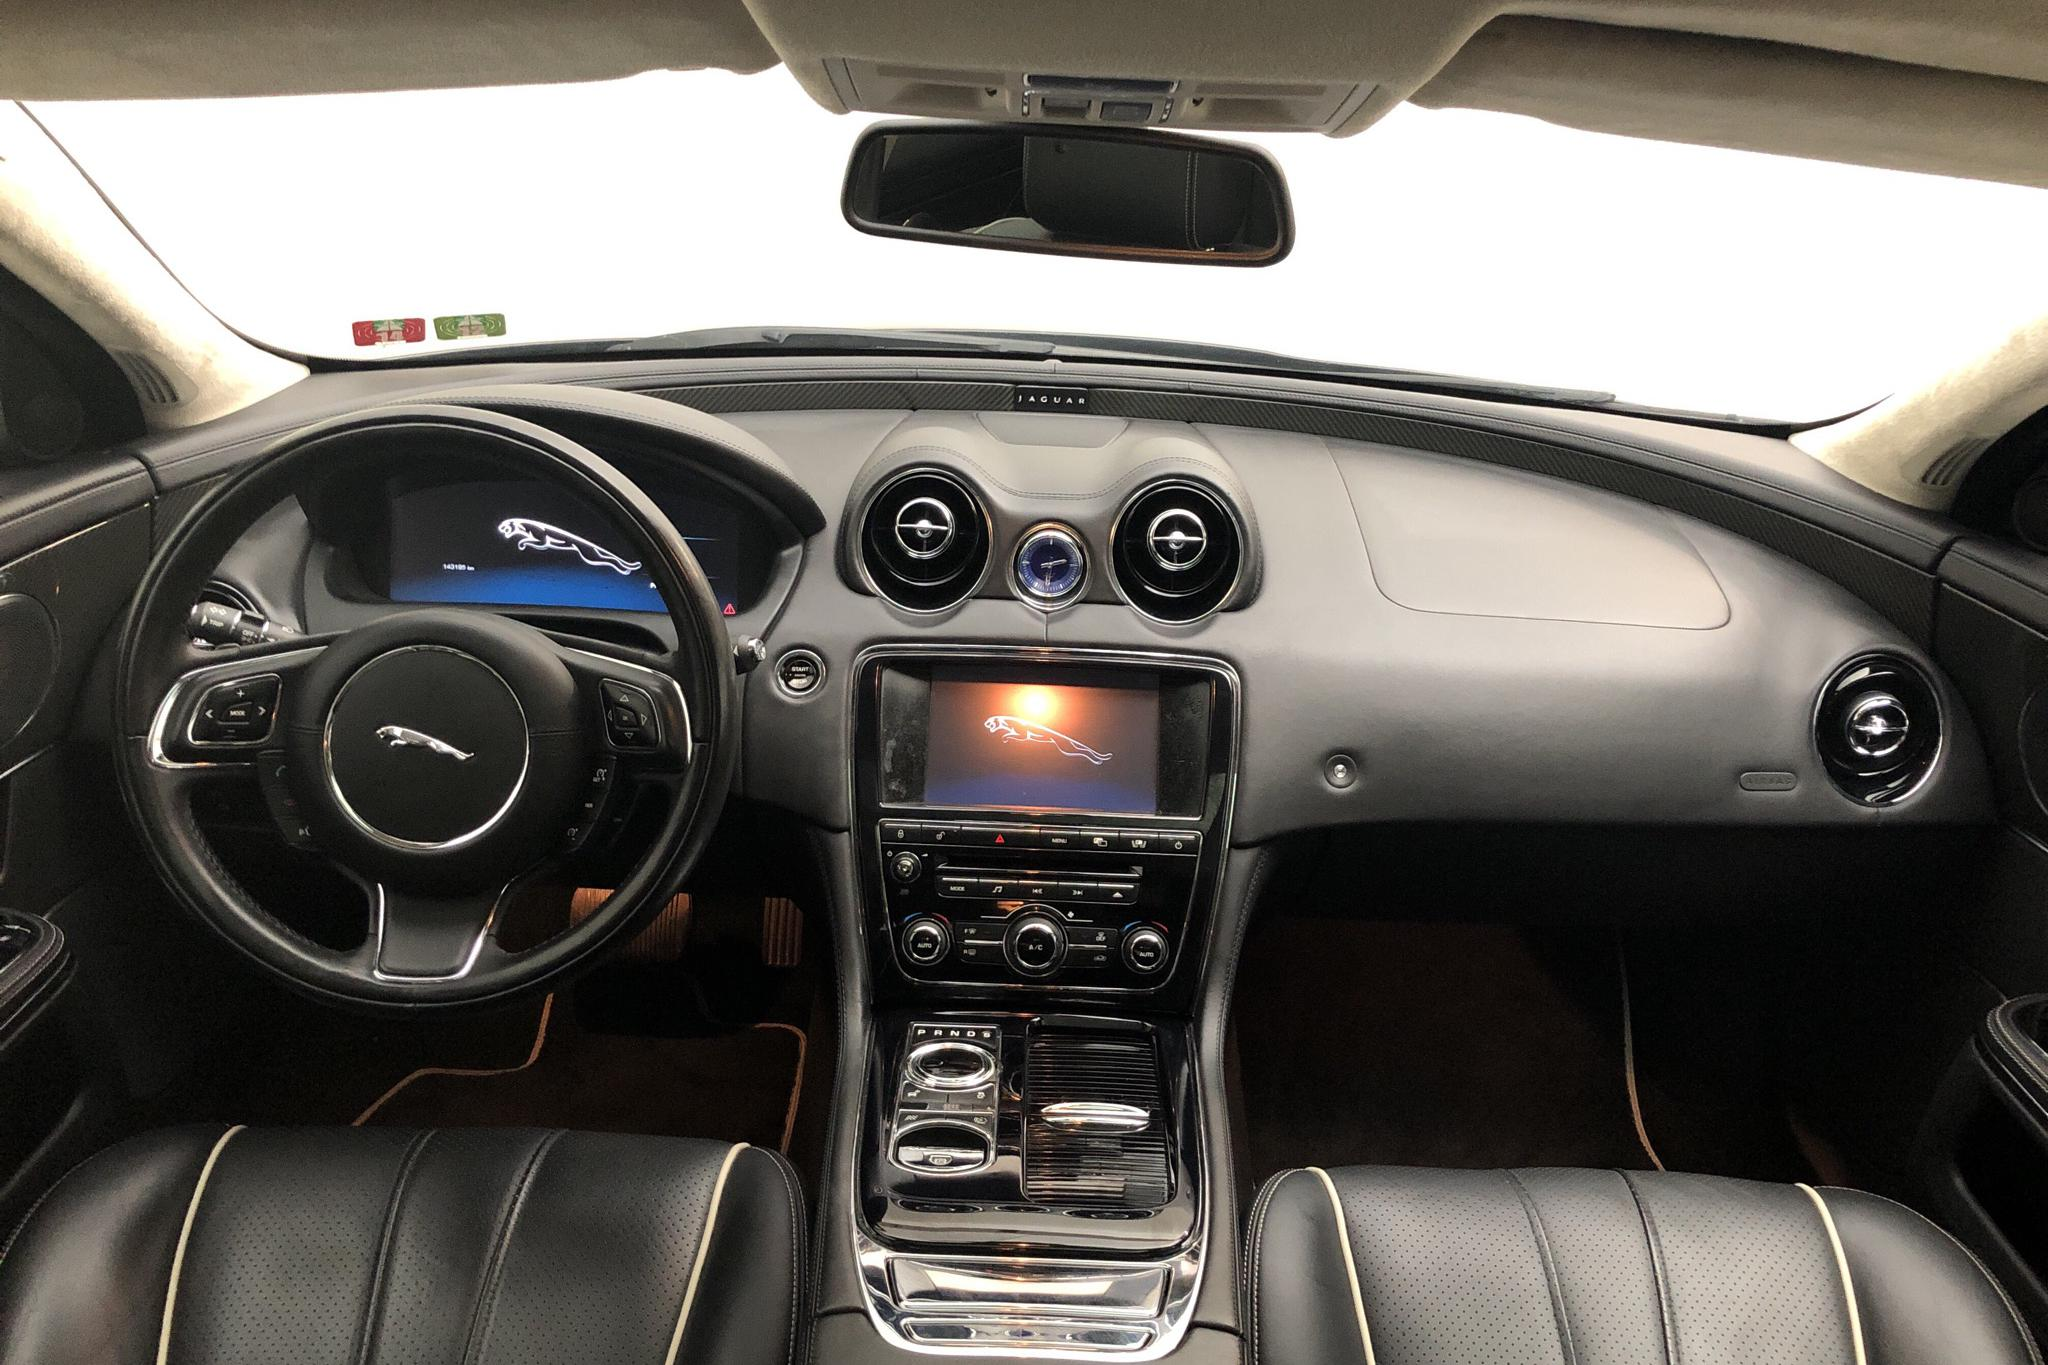 Jaguar XJ 3.0 D (275hk) - 14 320 mil - Automat - svart - 2010